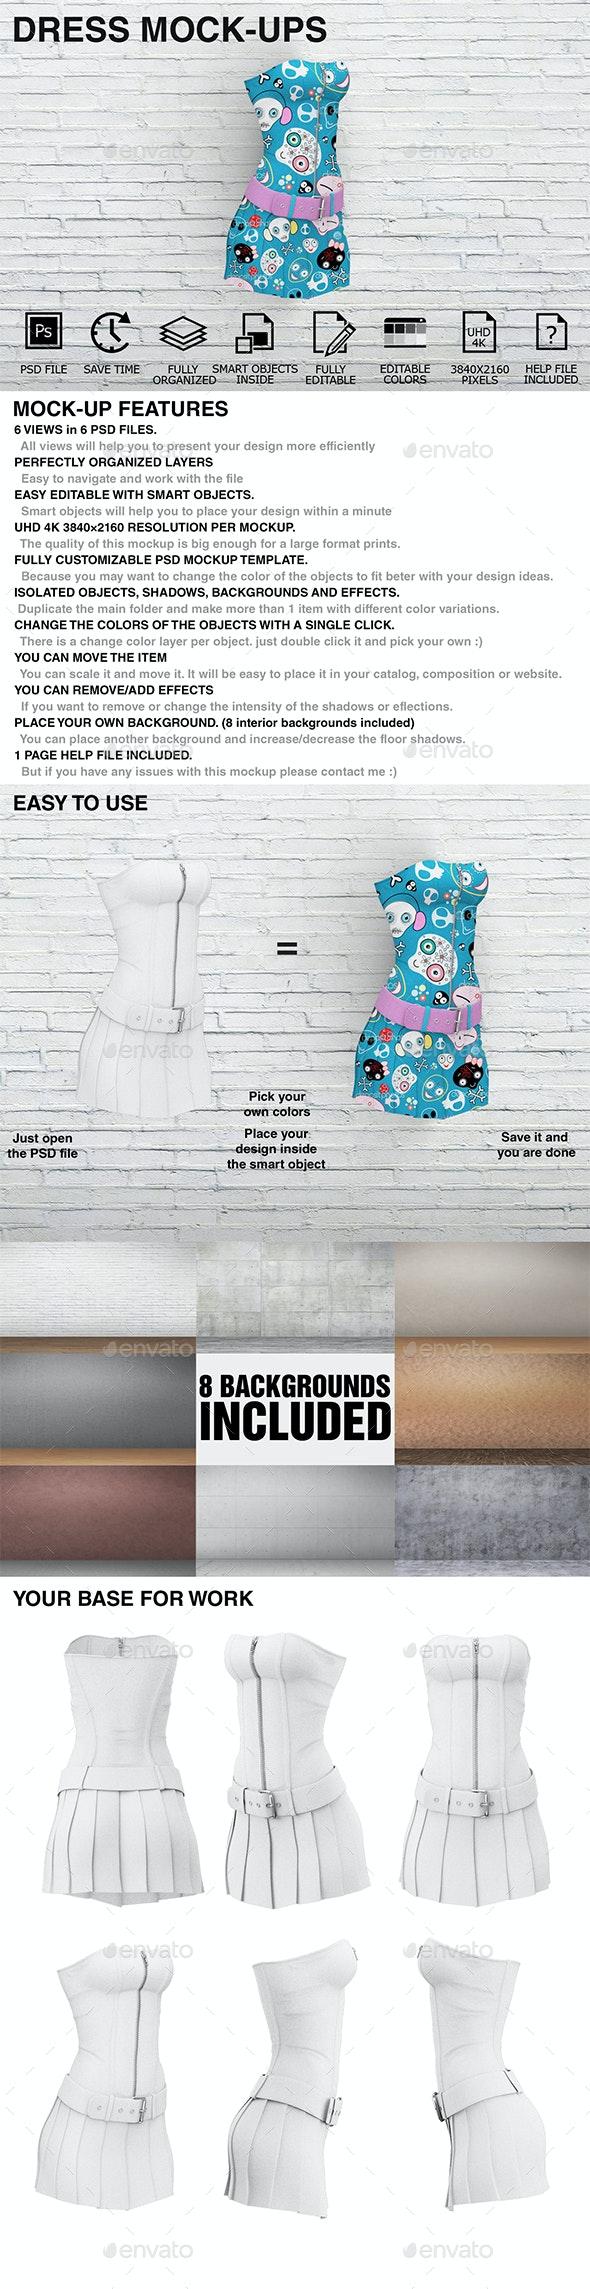 Dress Mockups - Women Clothing Mockups - Miscellaneous Apparel